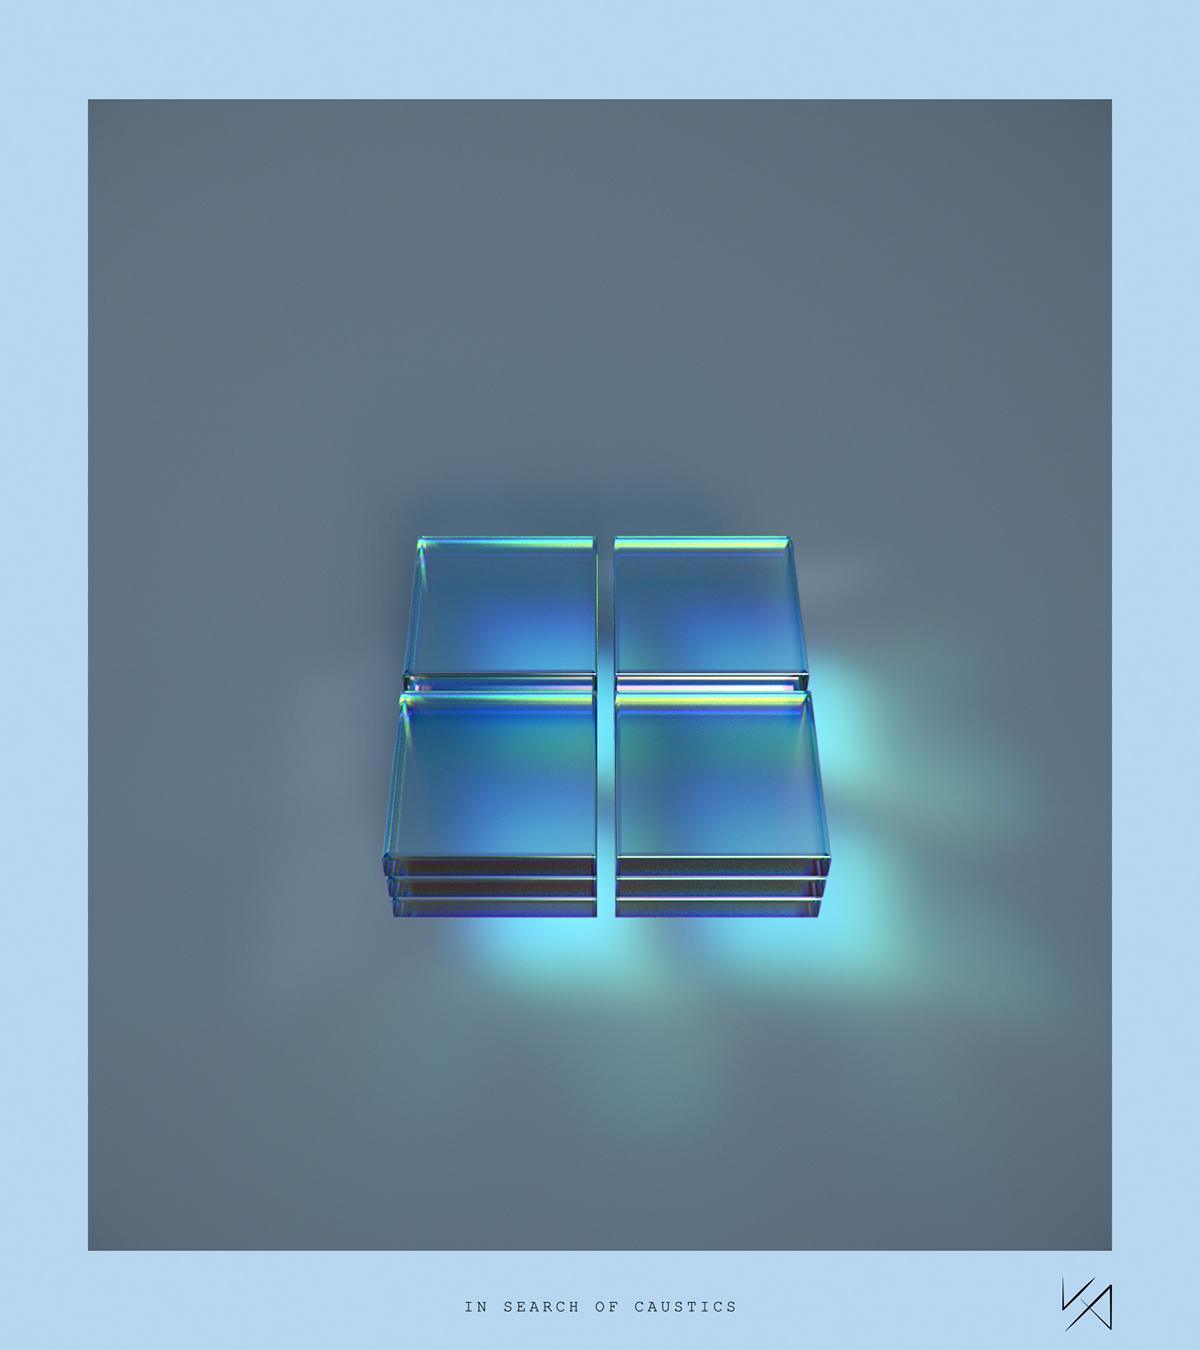 abstract c4d caustics glass redshift dispersion iridescent reflection refraction 3D